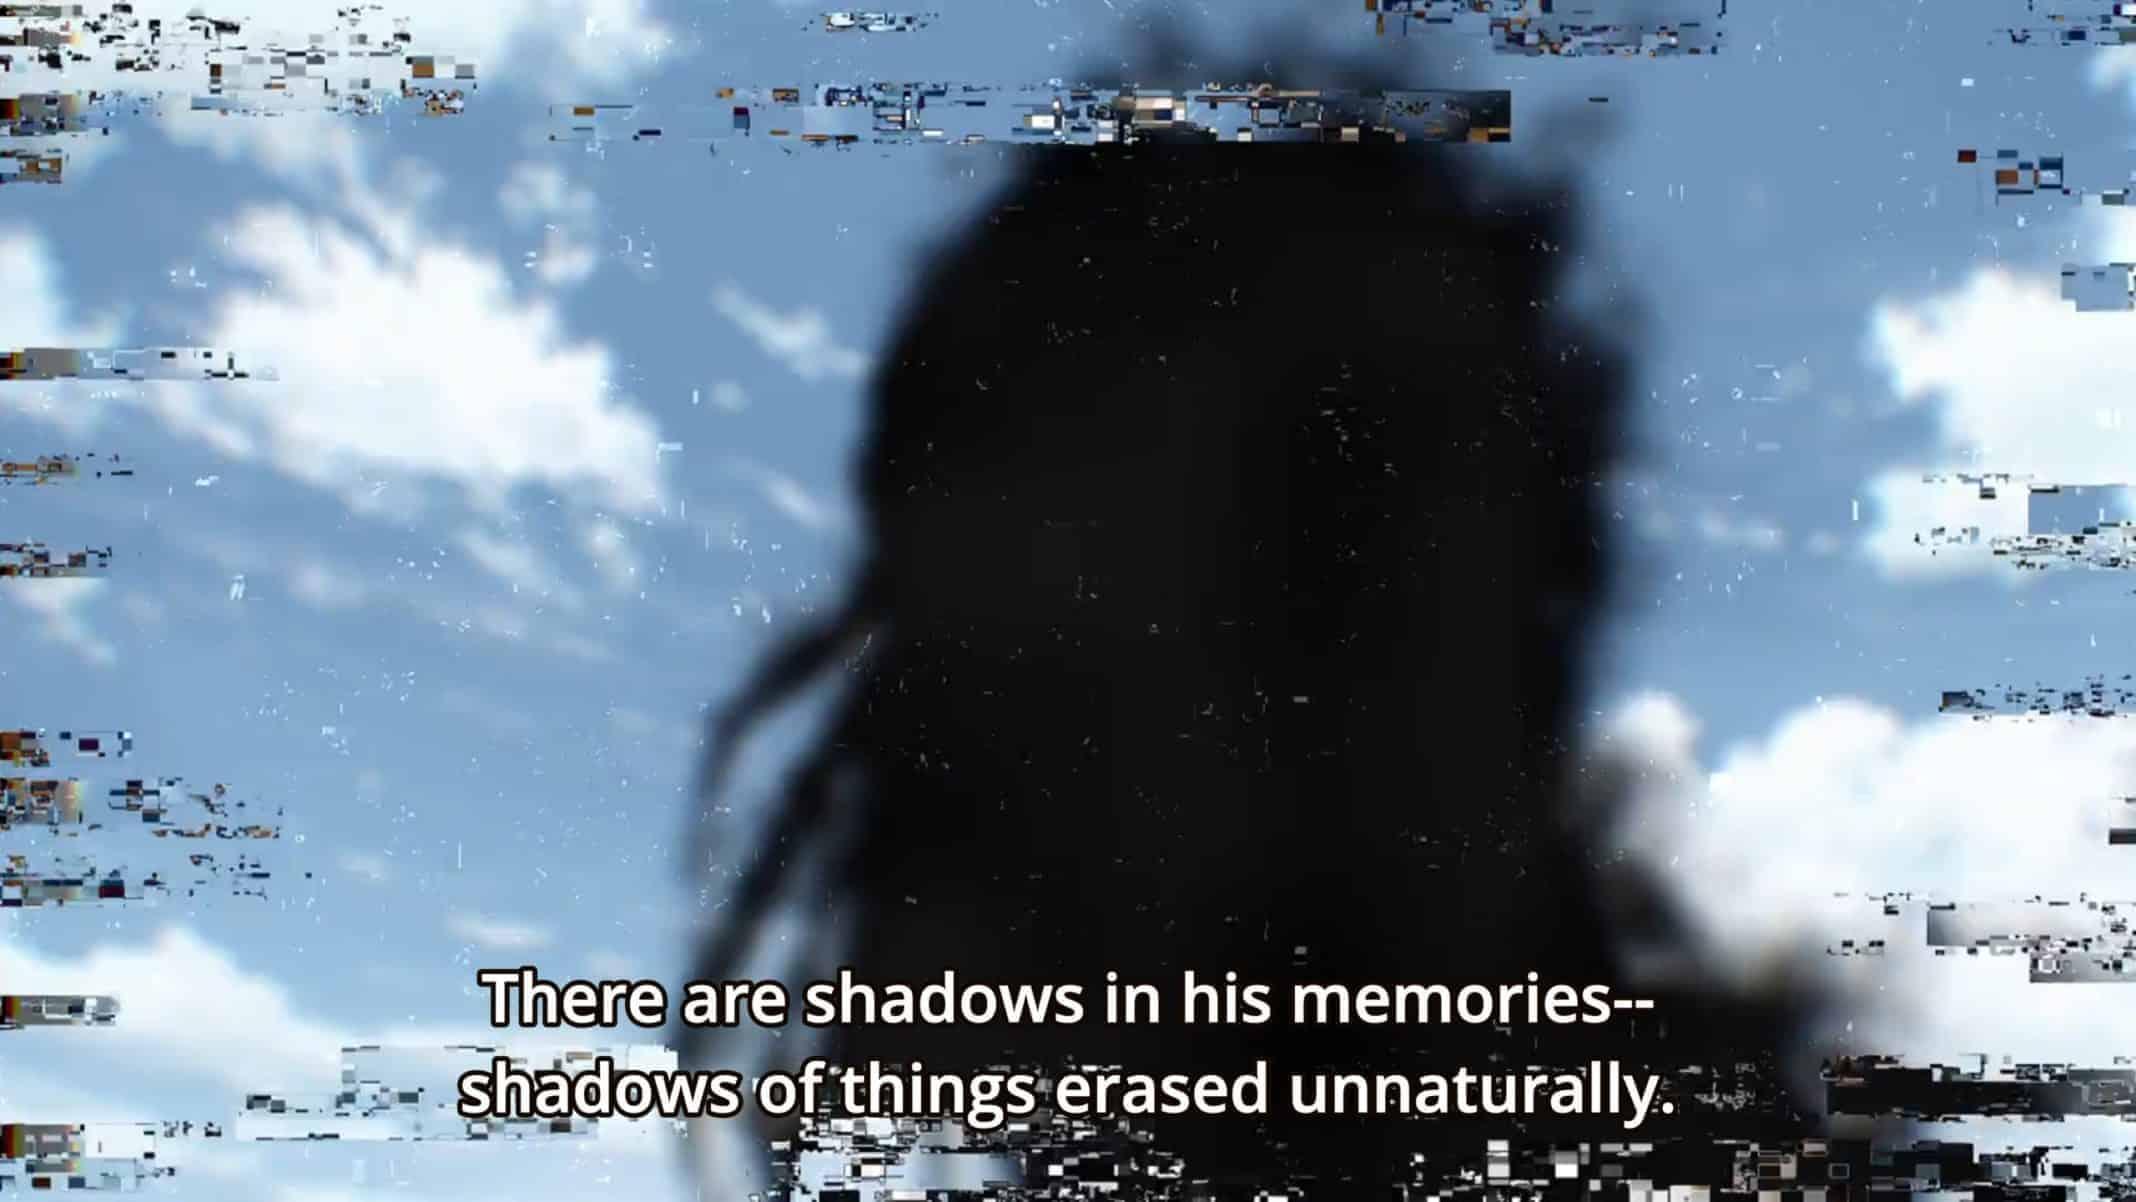 Yoshioka noting what she saw while in Shuichi's memories.